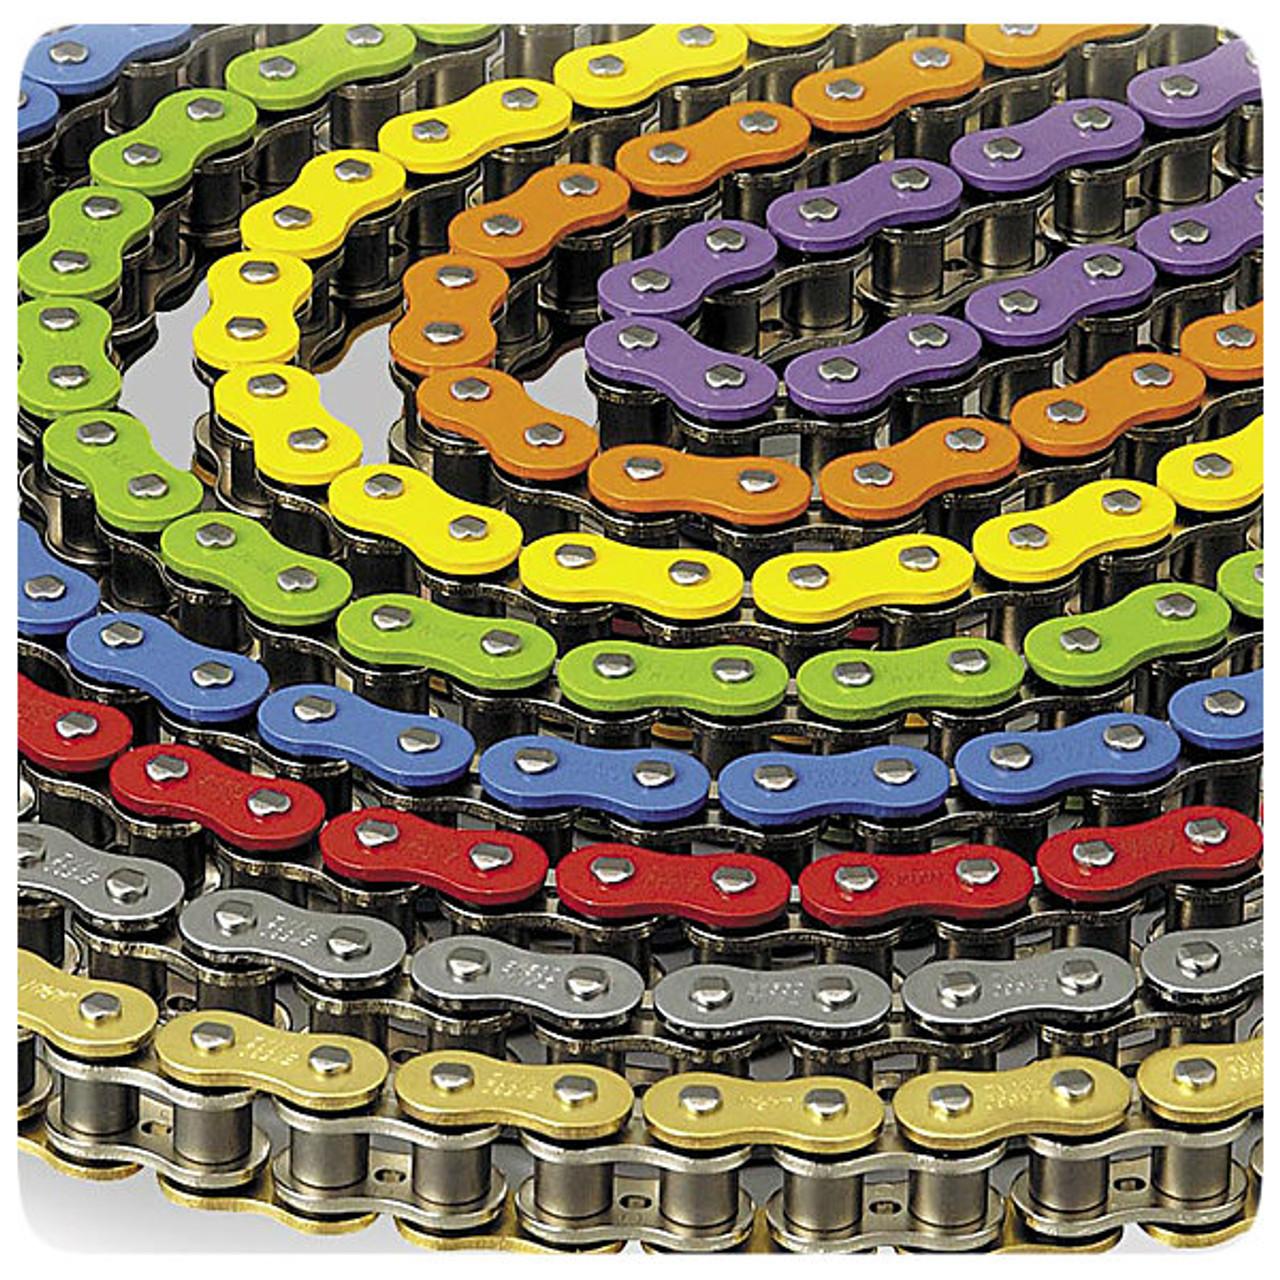 Honda CBR 1000RR Chain Nickel 150 link-530 O-Ring Extended Swingarm Extensions